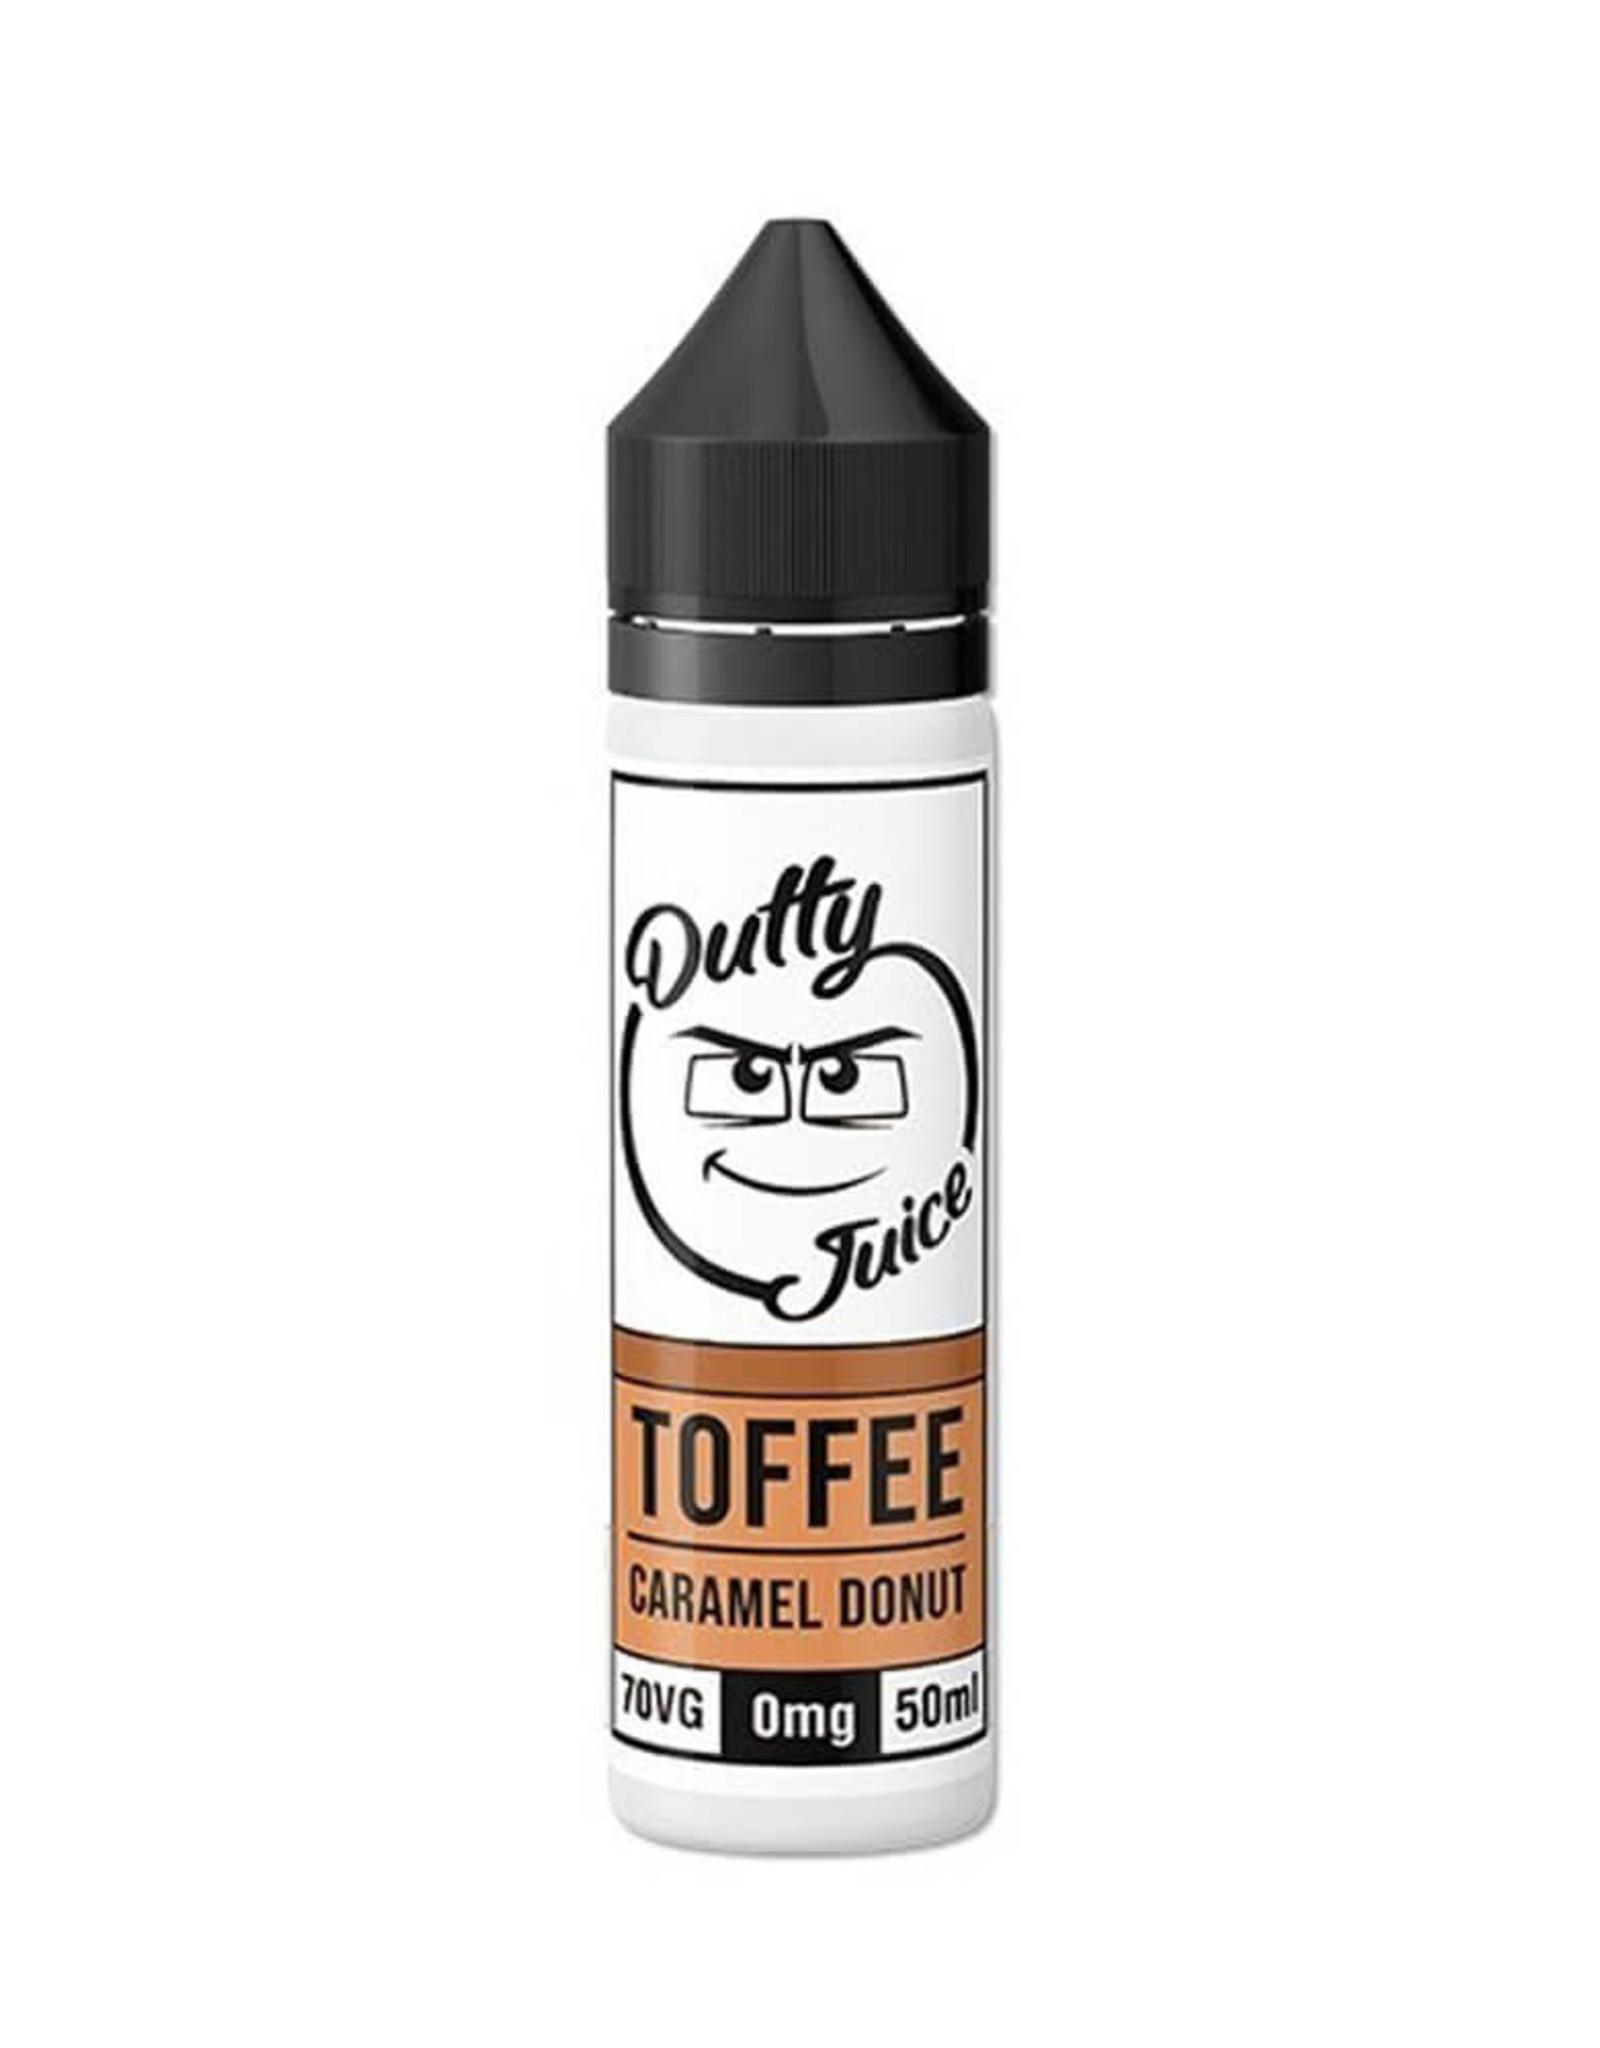 Dutty Dutty Juice - Toffee Caramel Donut 50ml